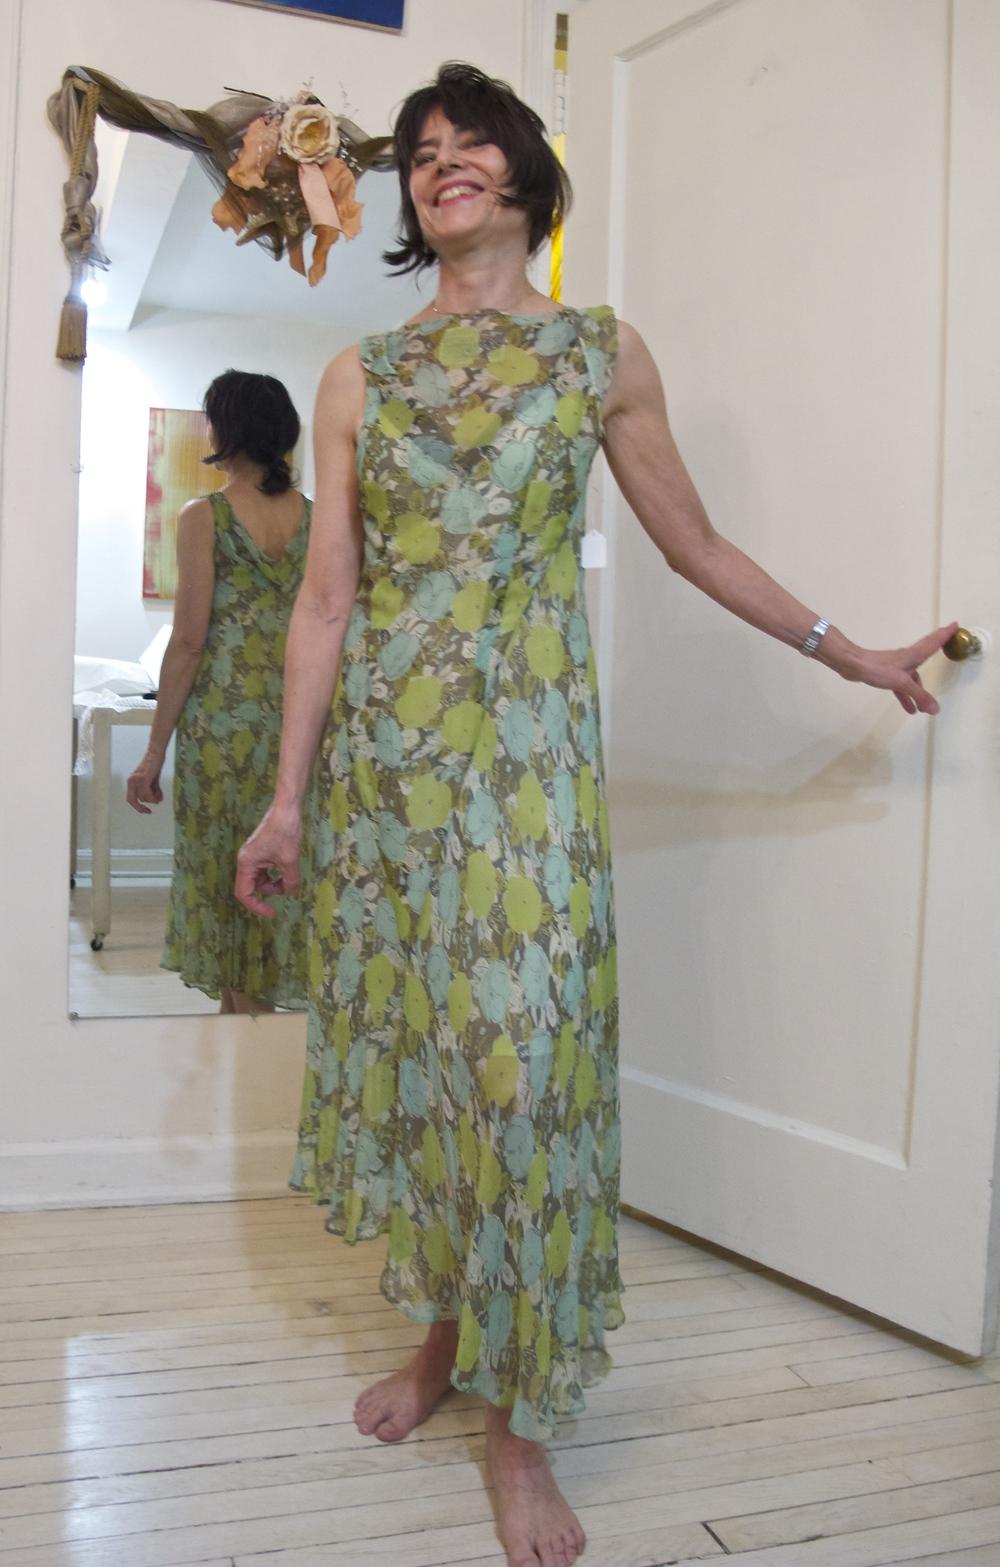 Flowered Chiffon dress worn by Mary Jones as wedding guest